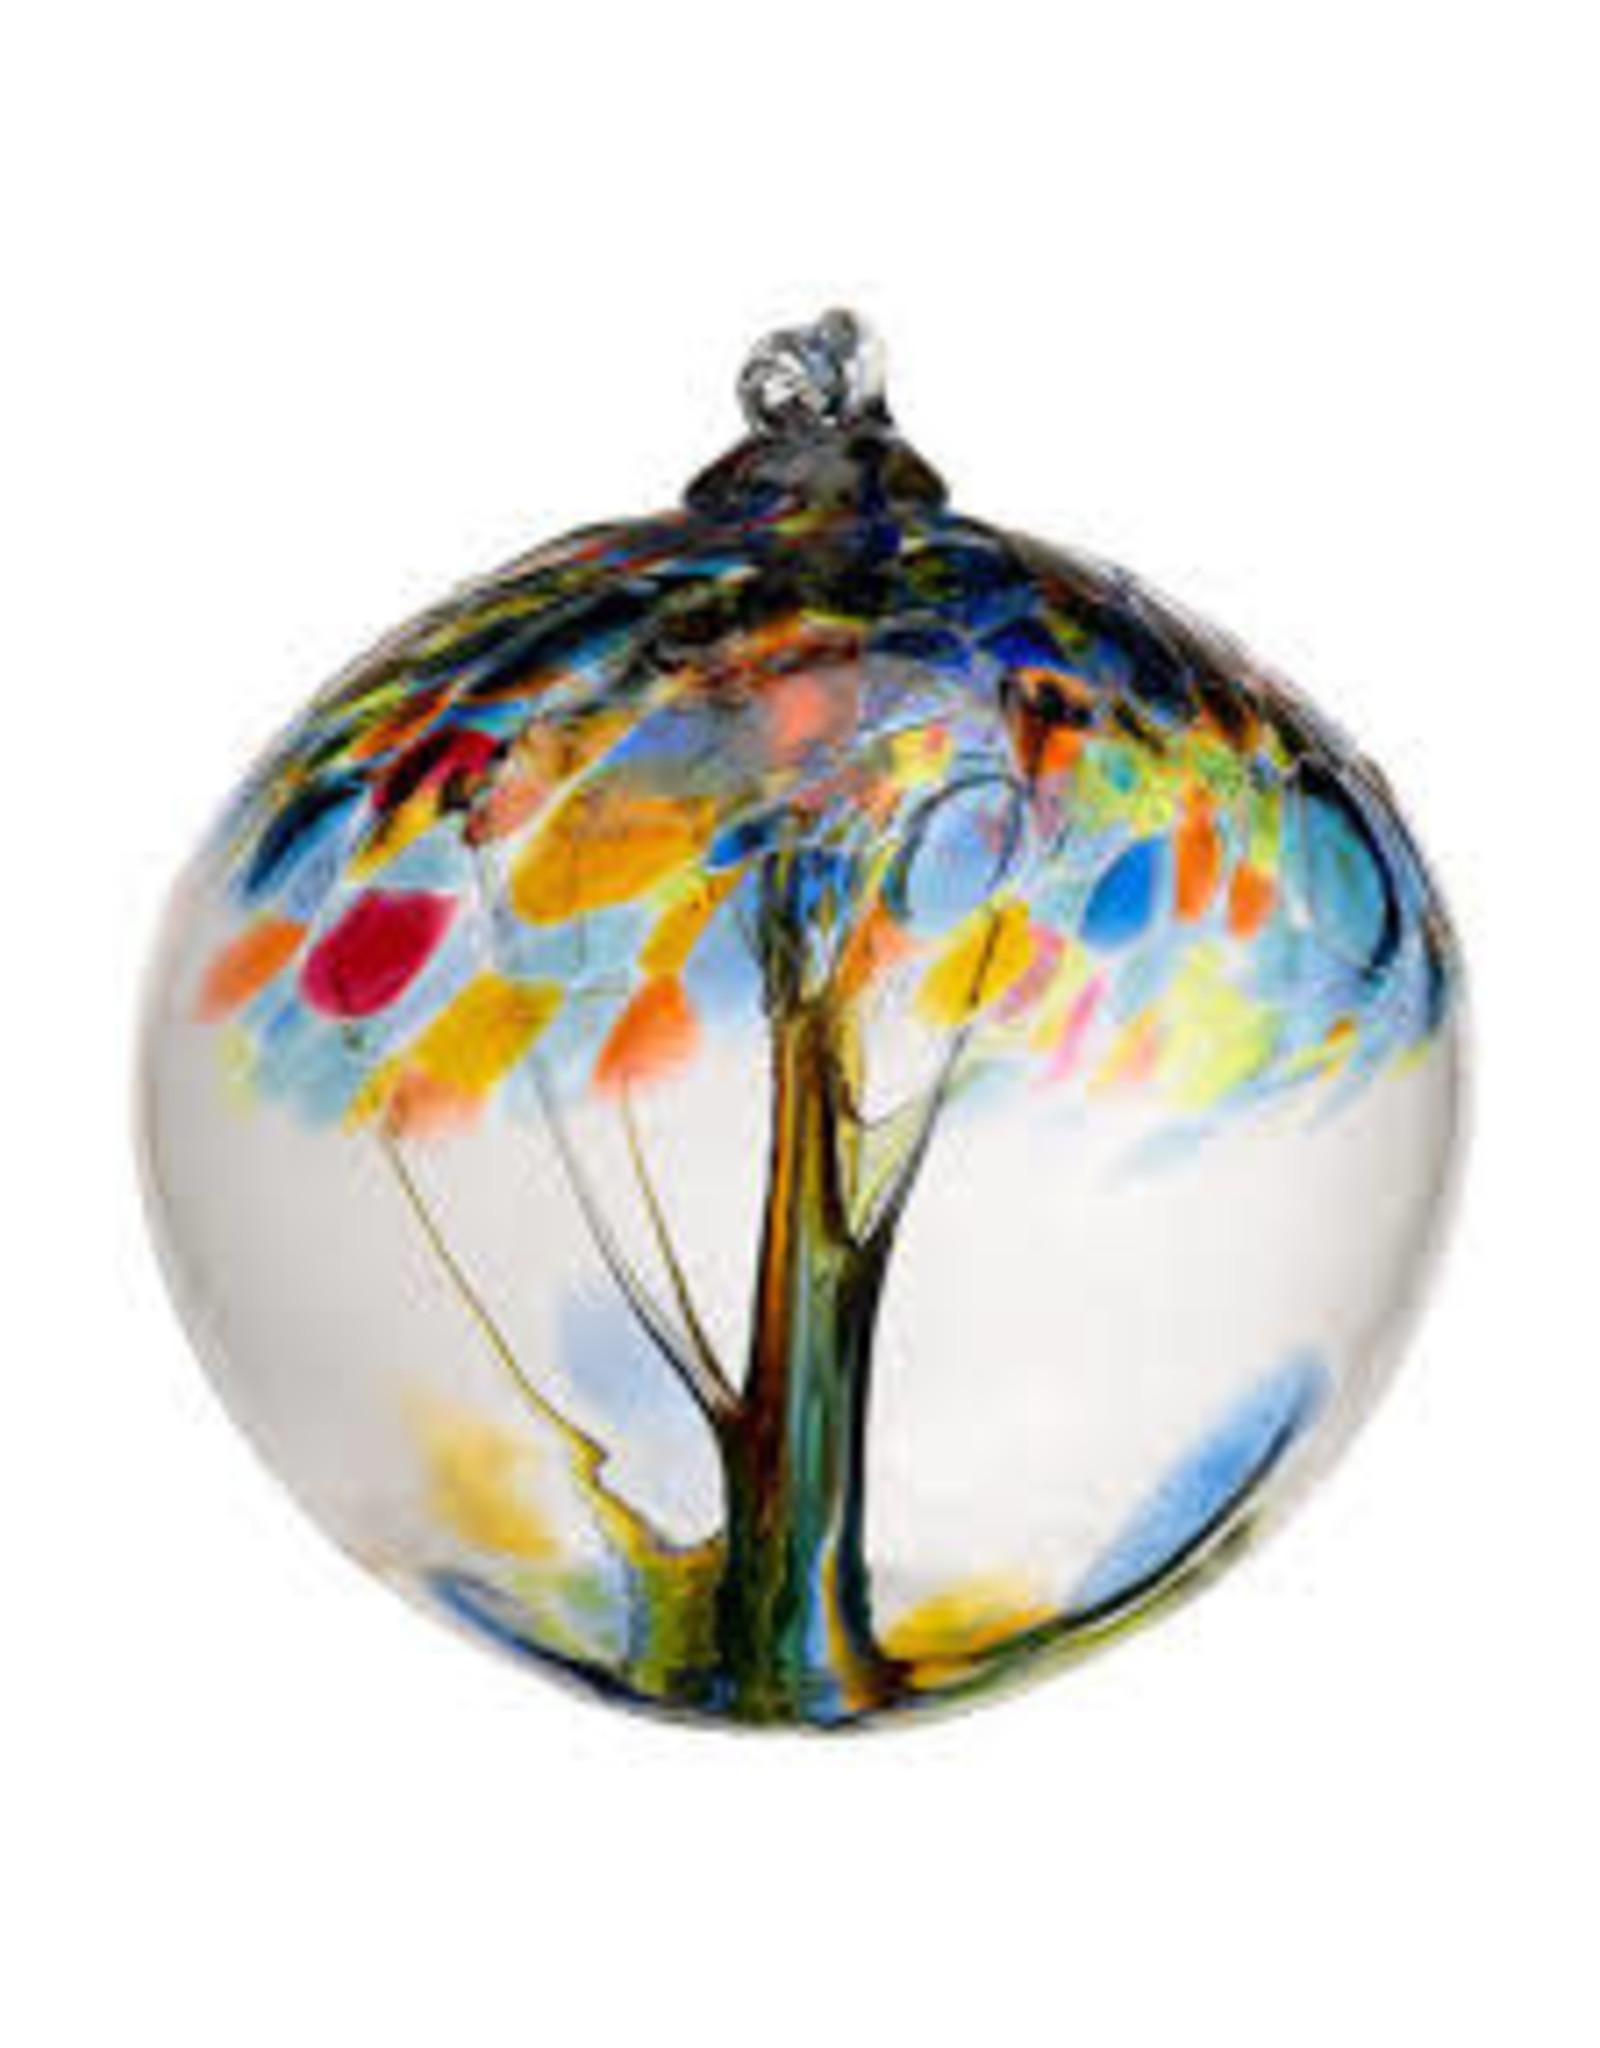 "Kitras Art Glass HOPE (Trees of Enchantment, 6"" D., KITRAS)"